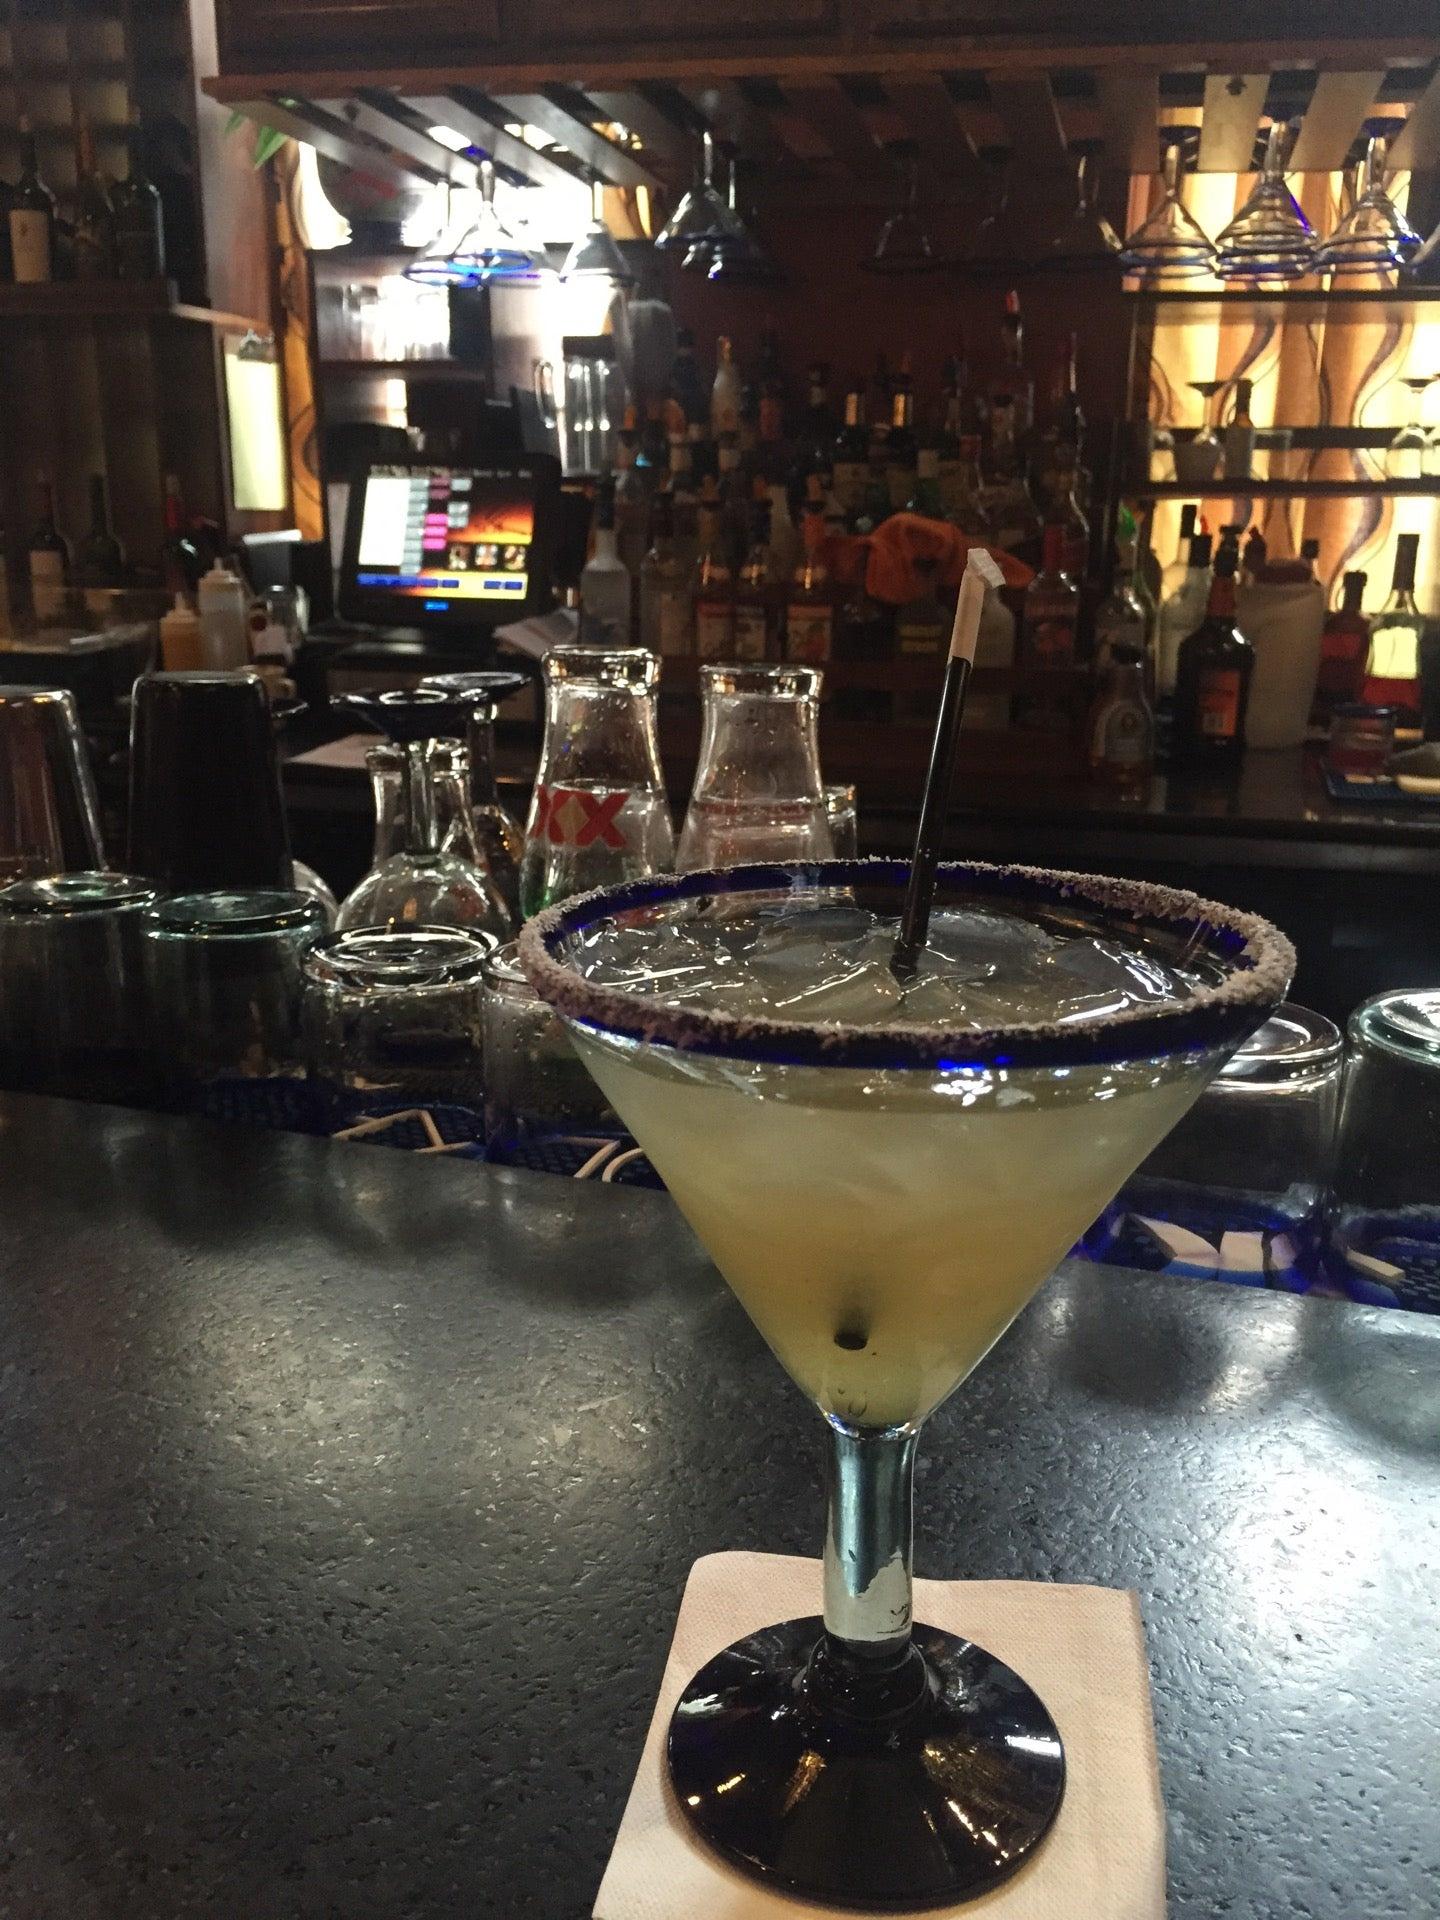 EL SOL MEXICAN RESTAURANT,bar,dinner,margaritas,mexican,restaurant,tacos